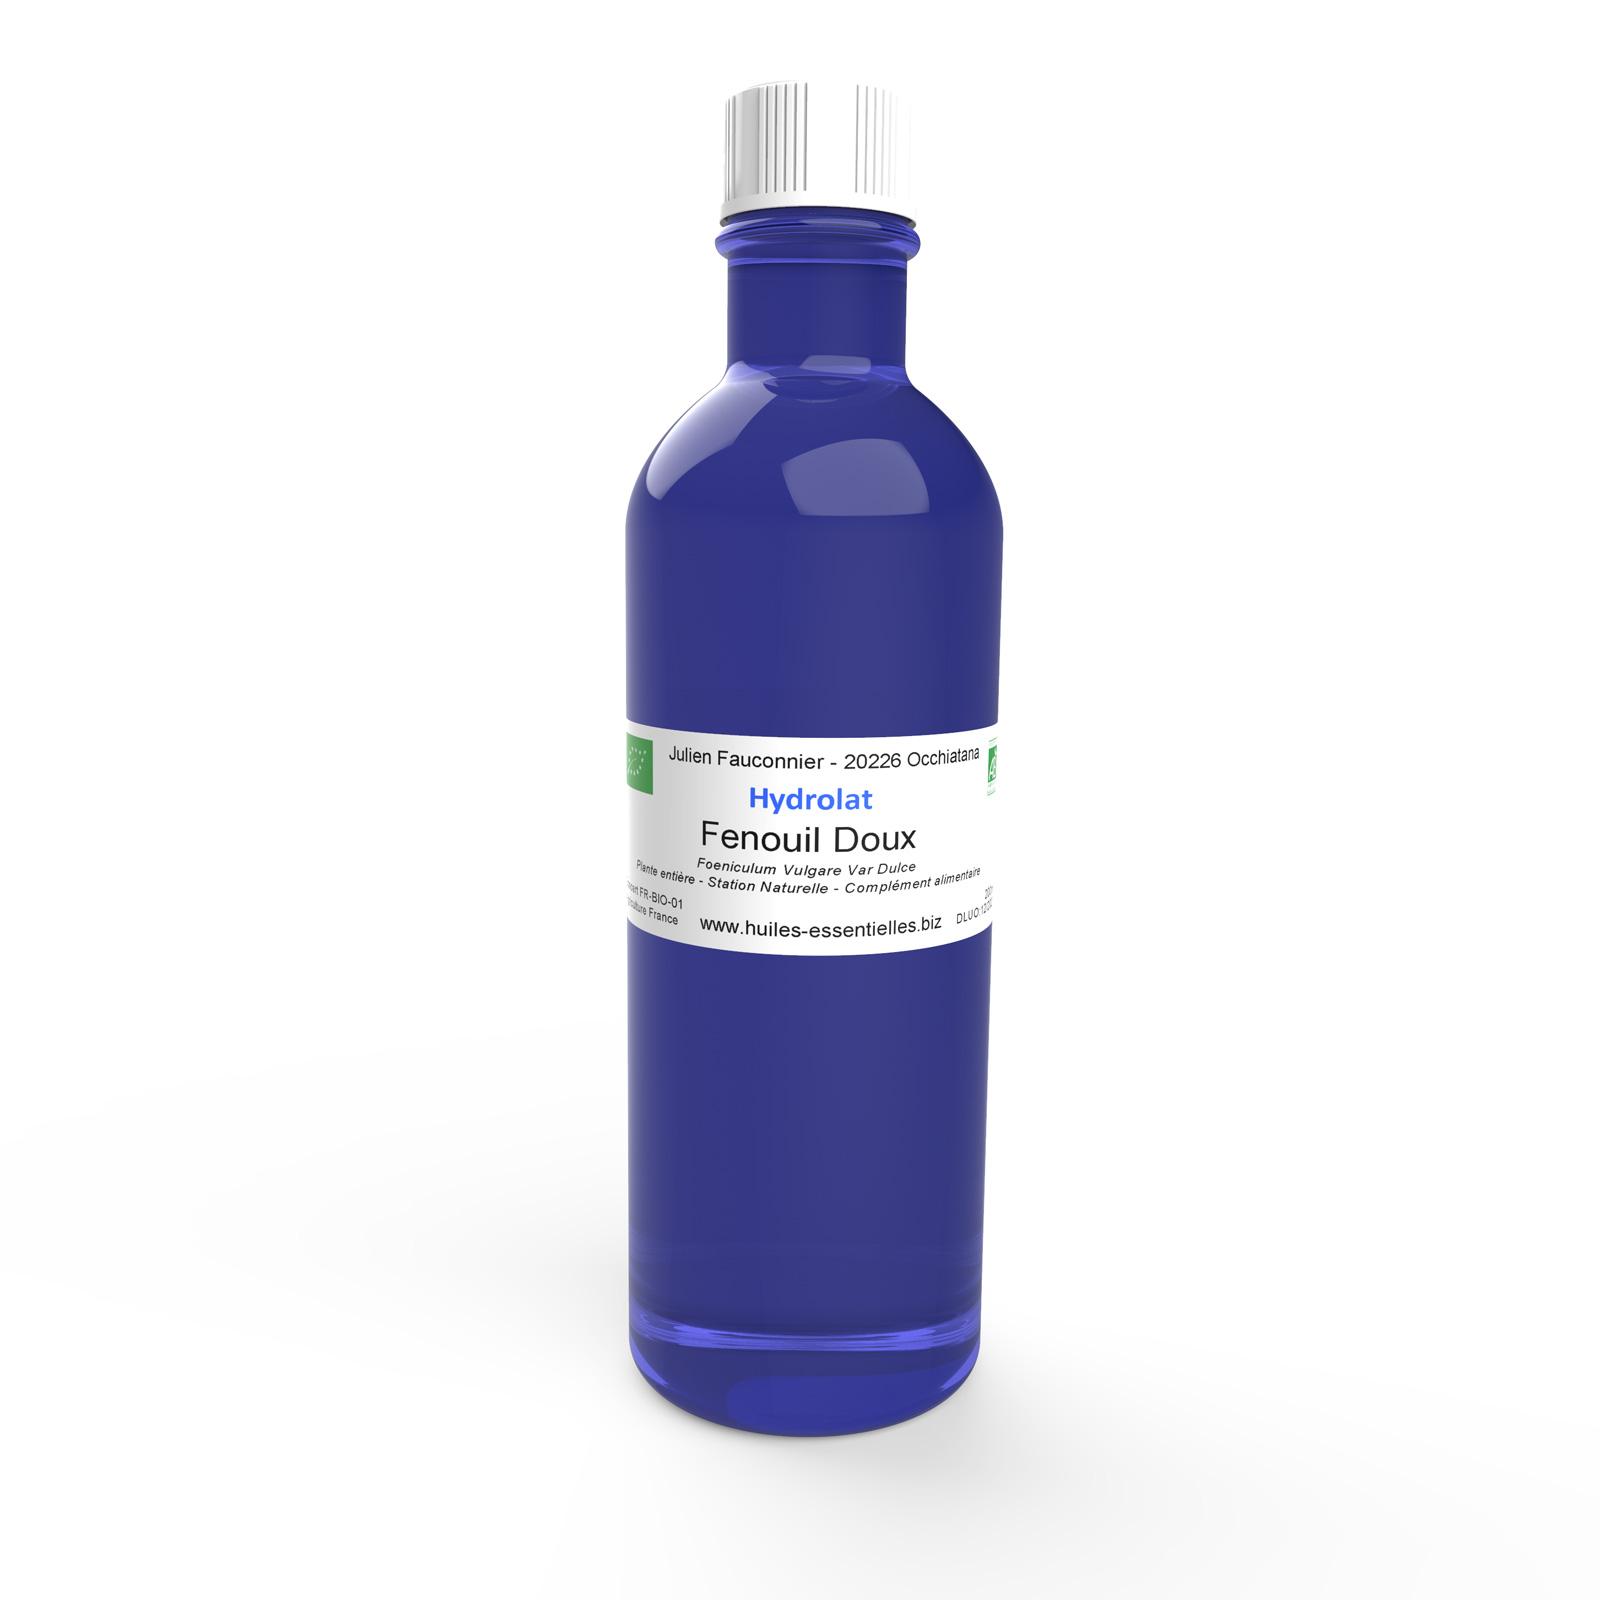 Hydrolat de Fenouil doux